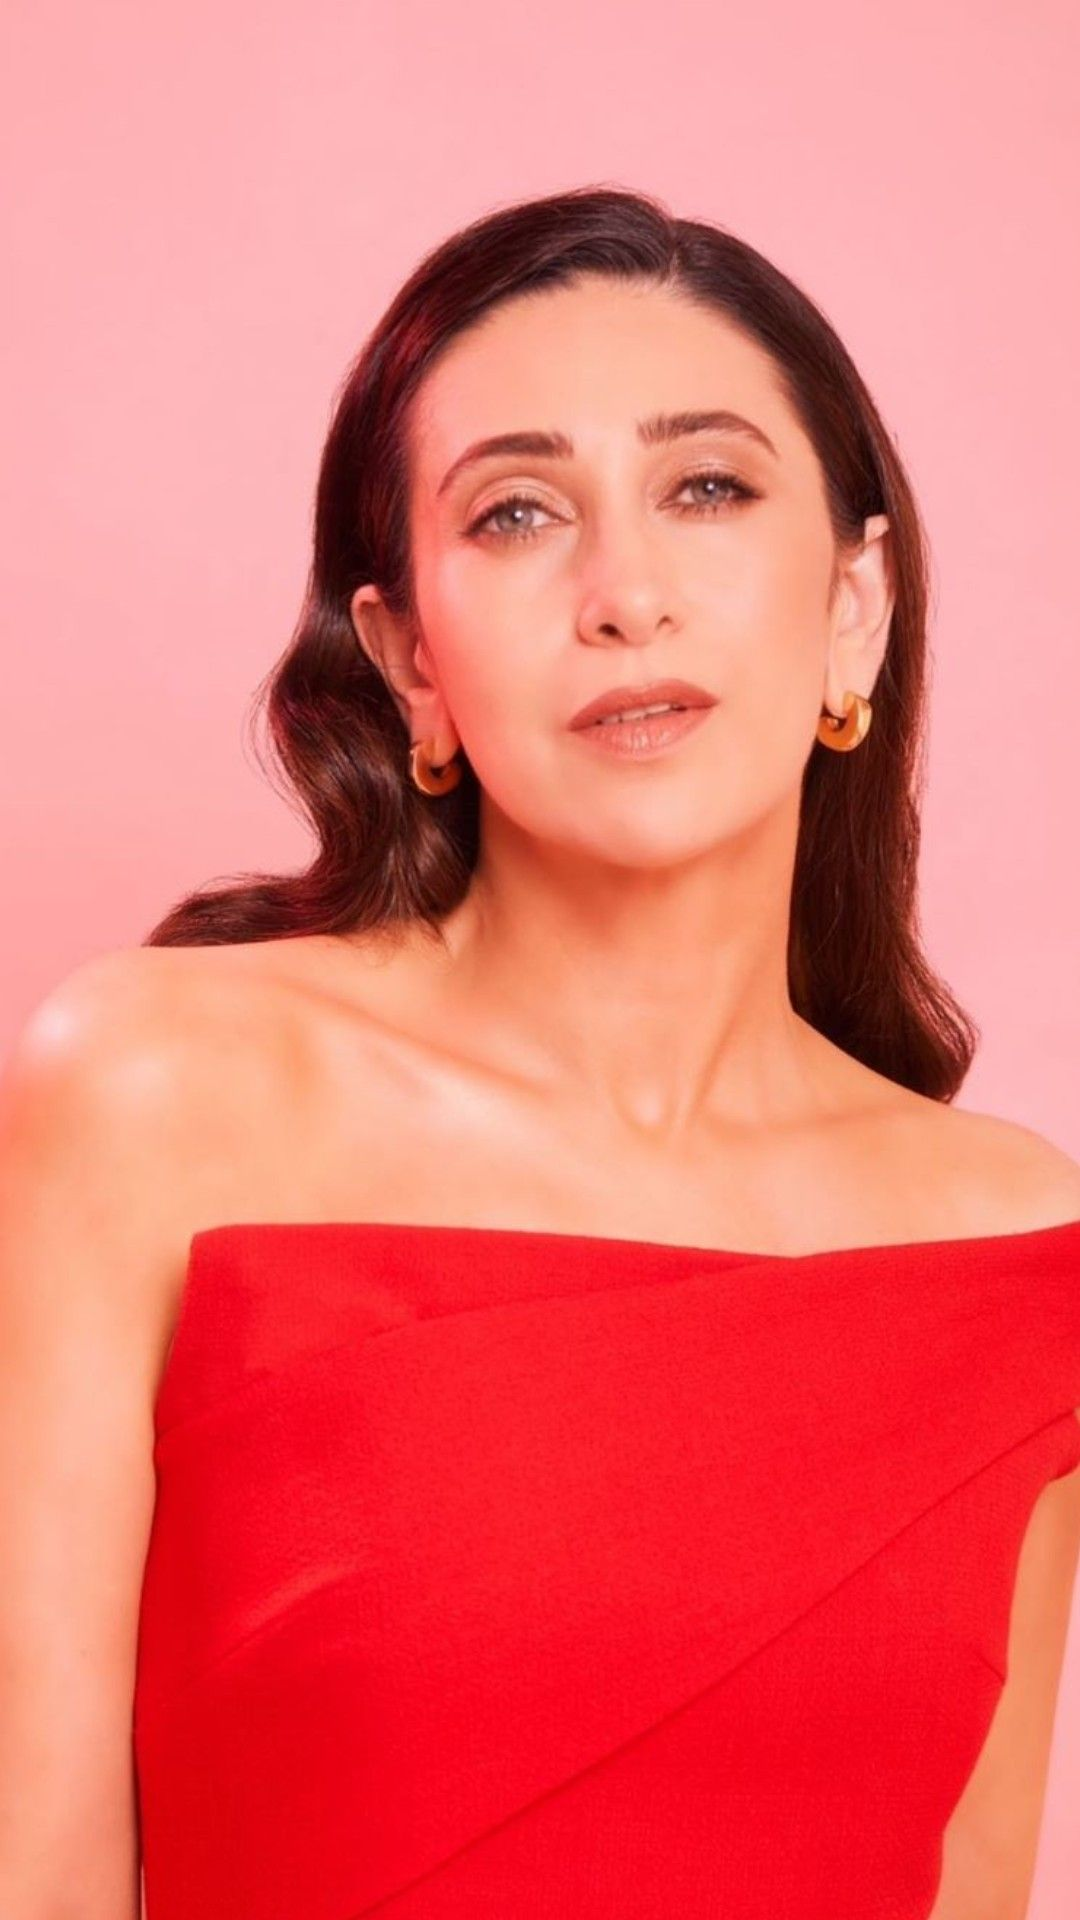 Pin by Naziya Ali on Filmy Queens in 2020 | Celebrities ...